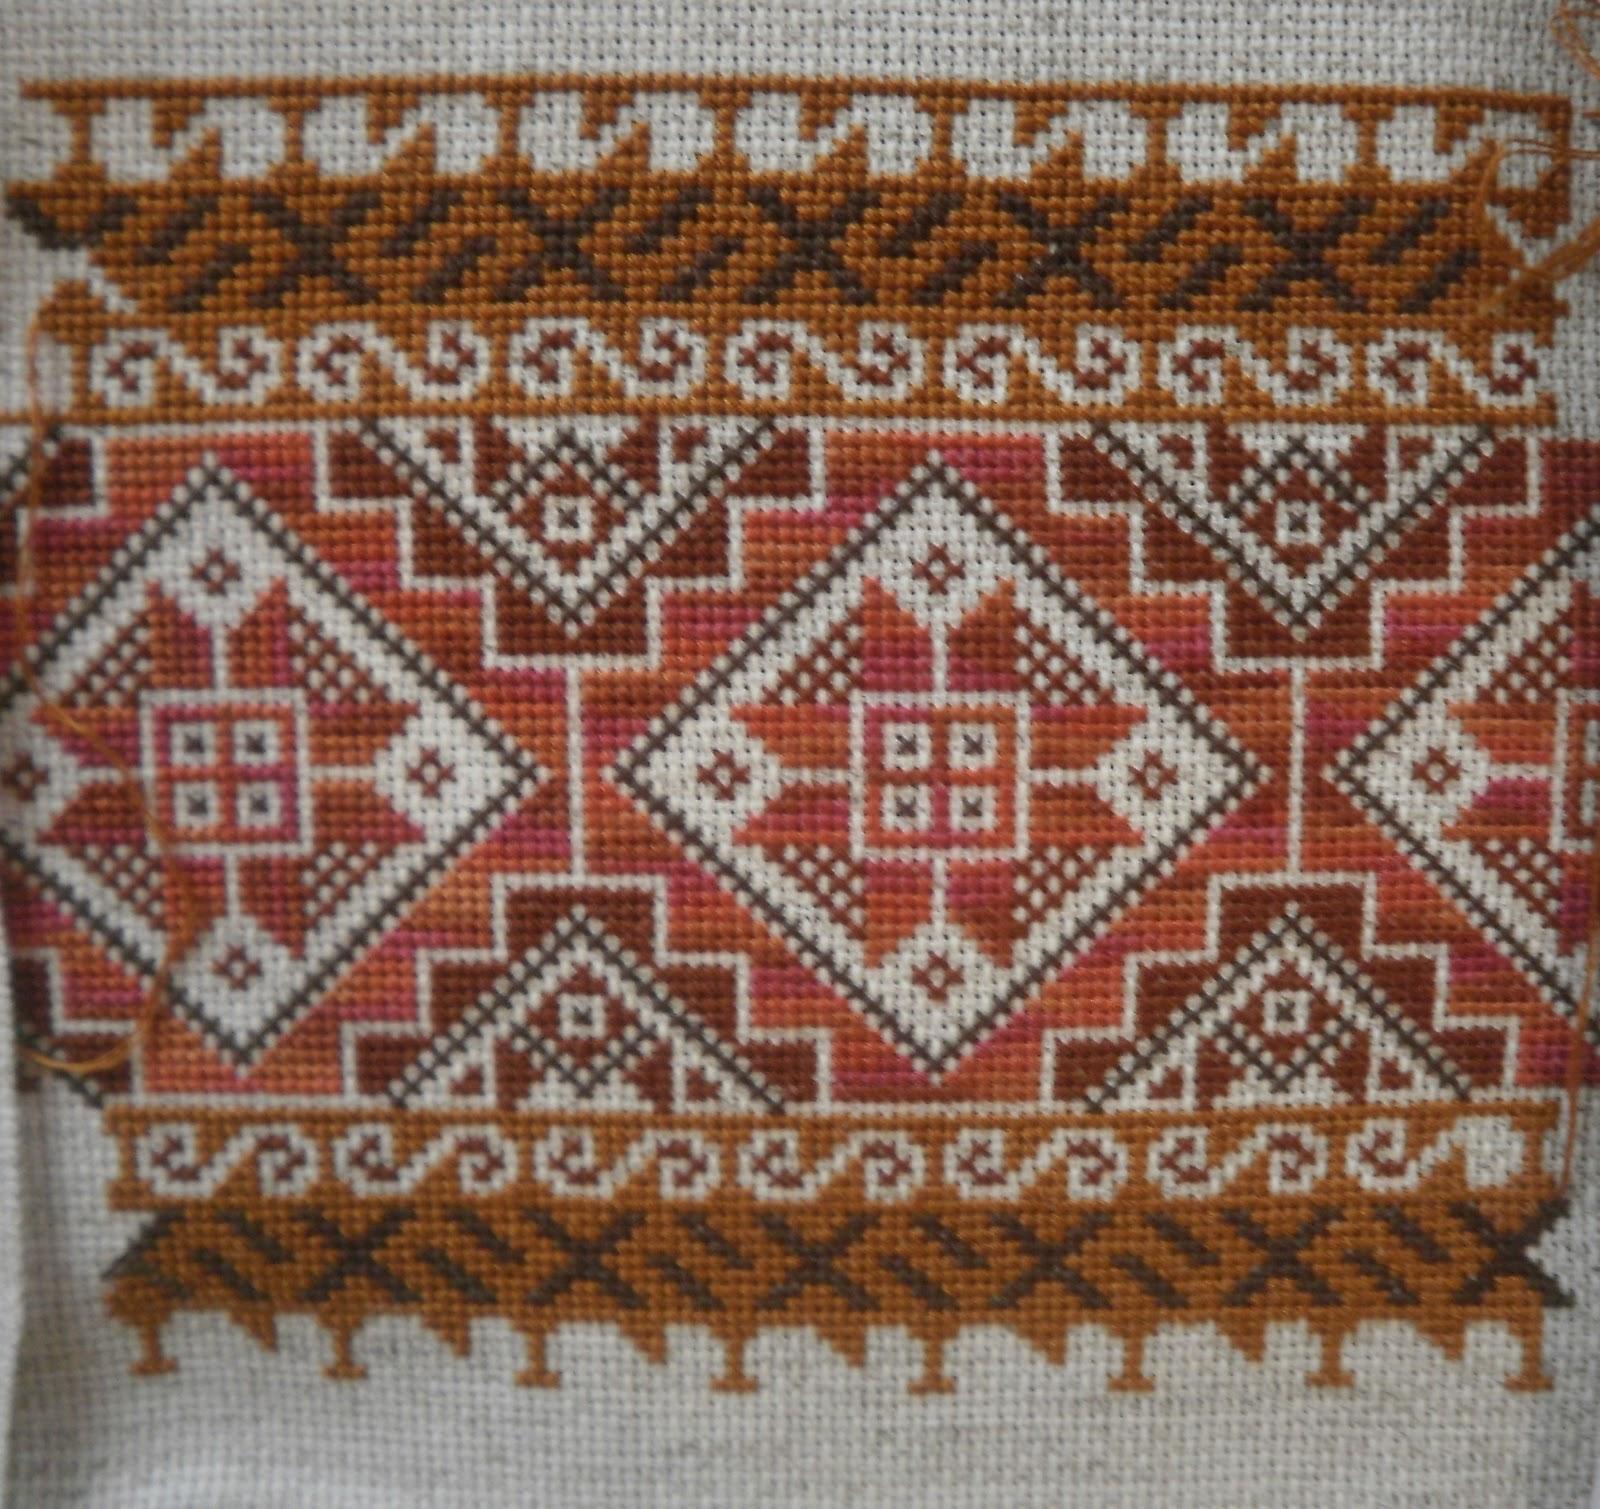 The world according to Ági: hungarian folk art motifs stitched